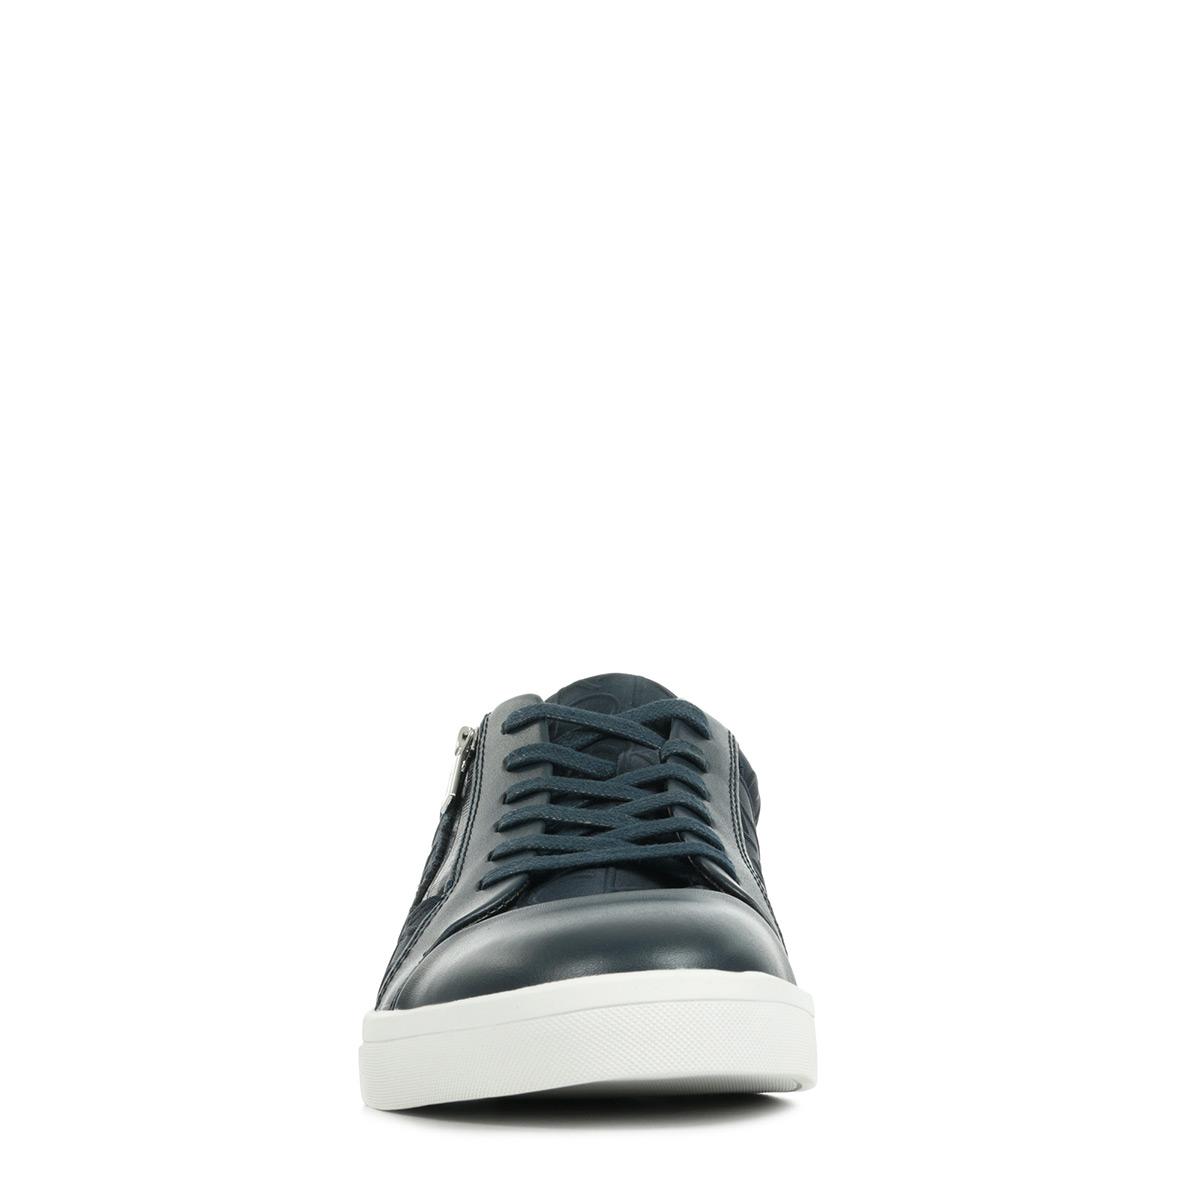 b07ea20e117932 Calvin Klein Ibrahim Dark Navy F0875DNY Baskets mode homme achats ...